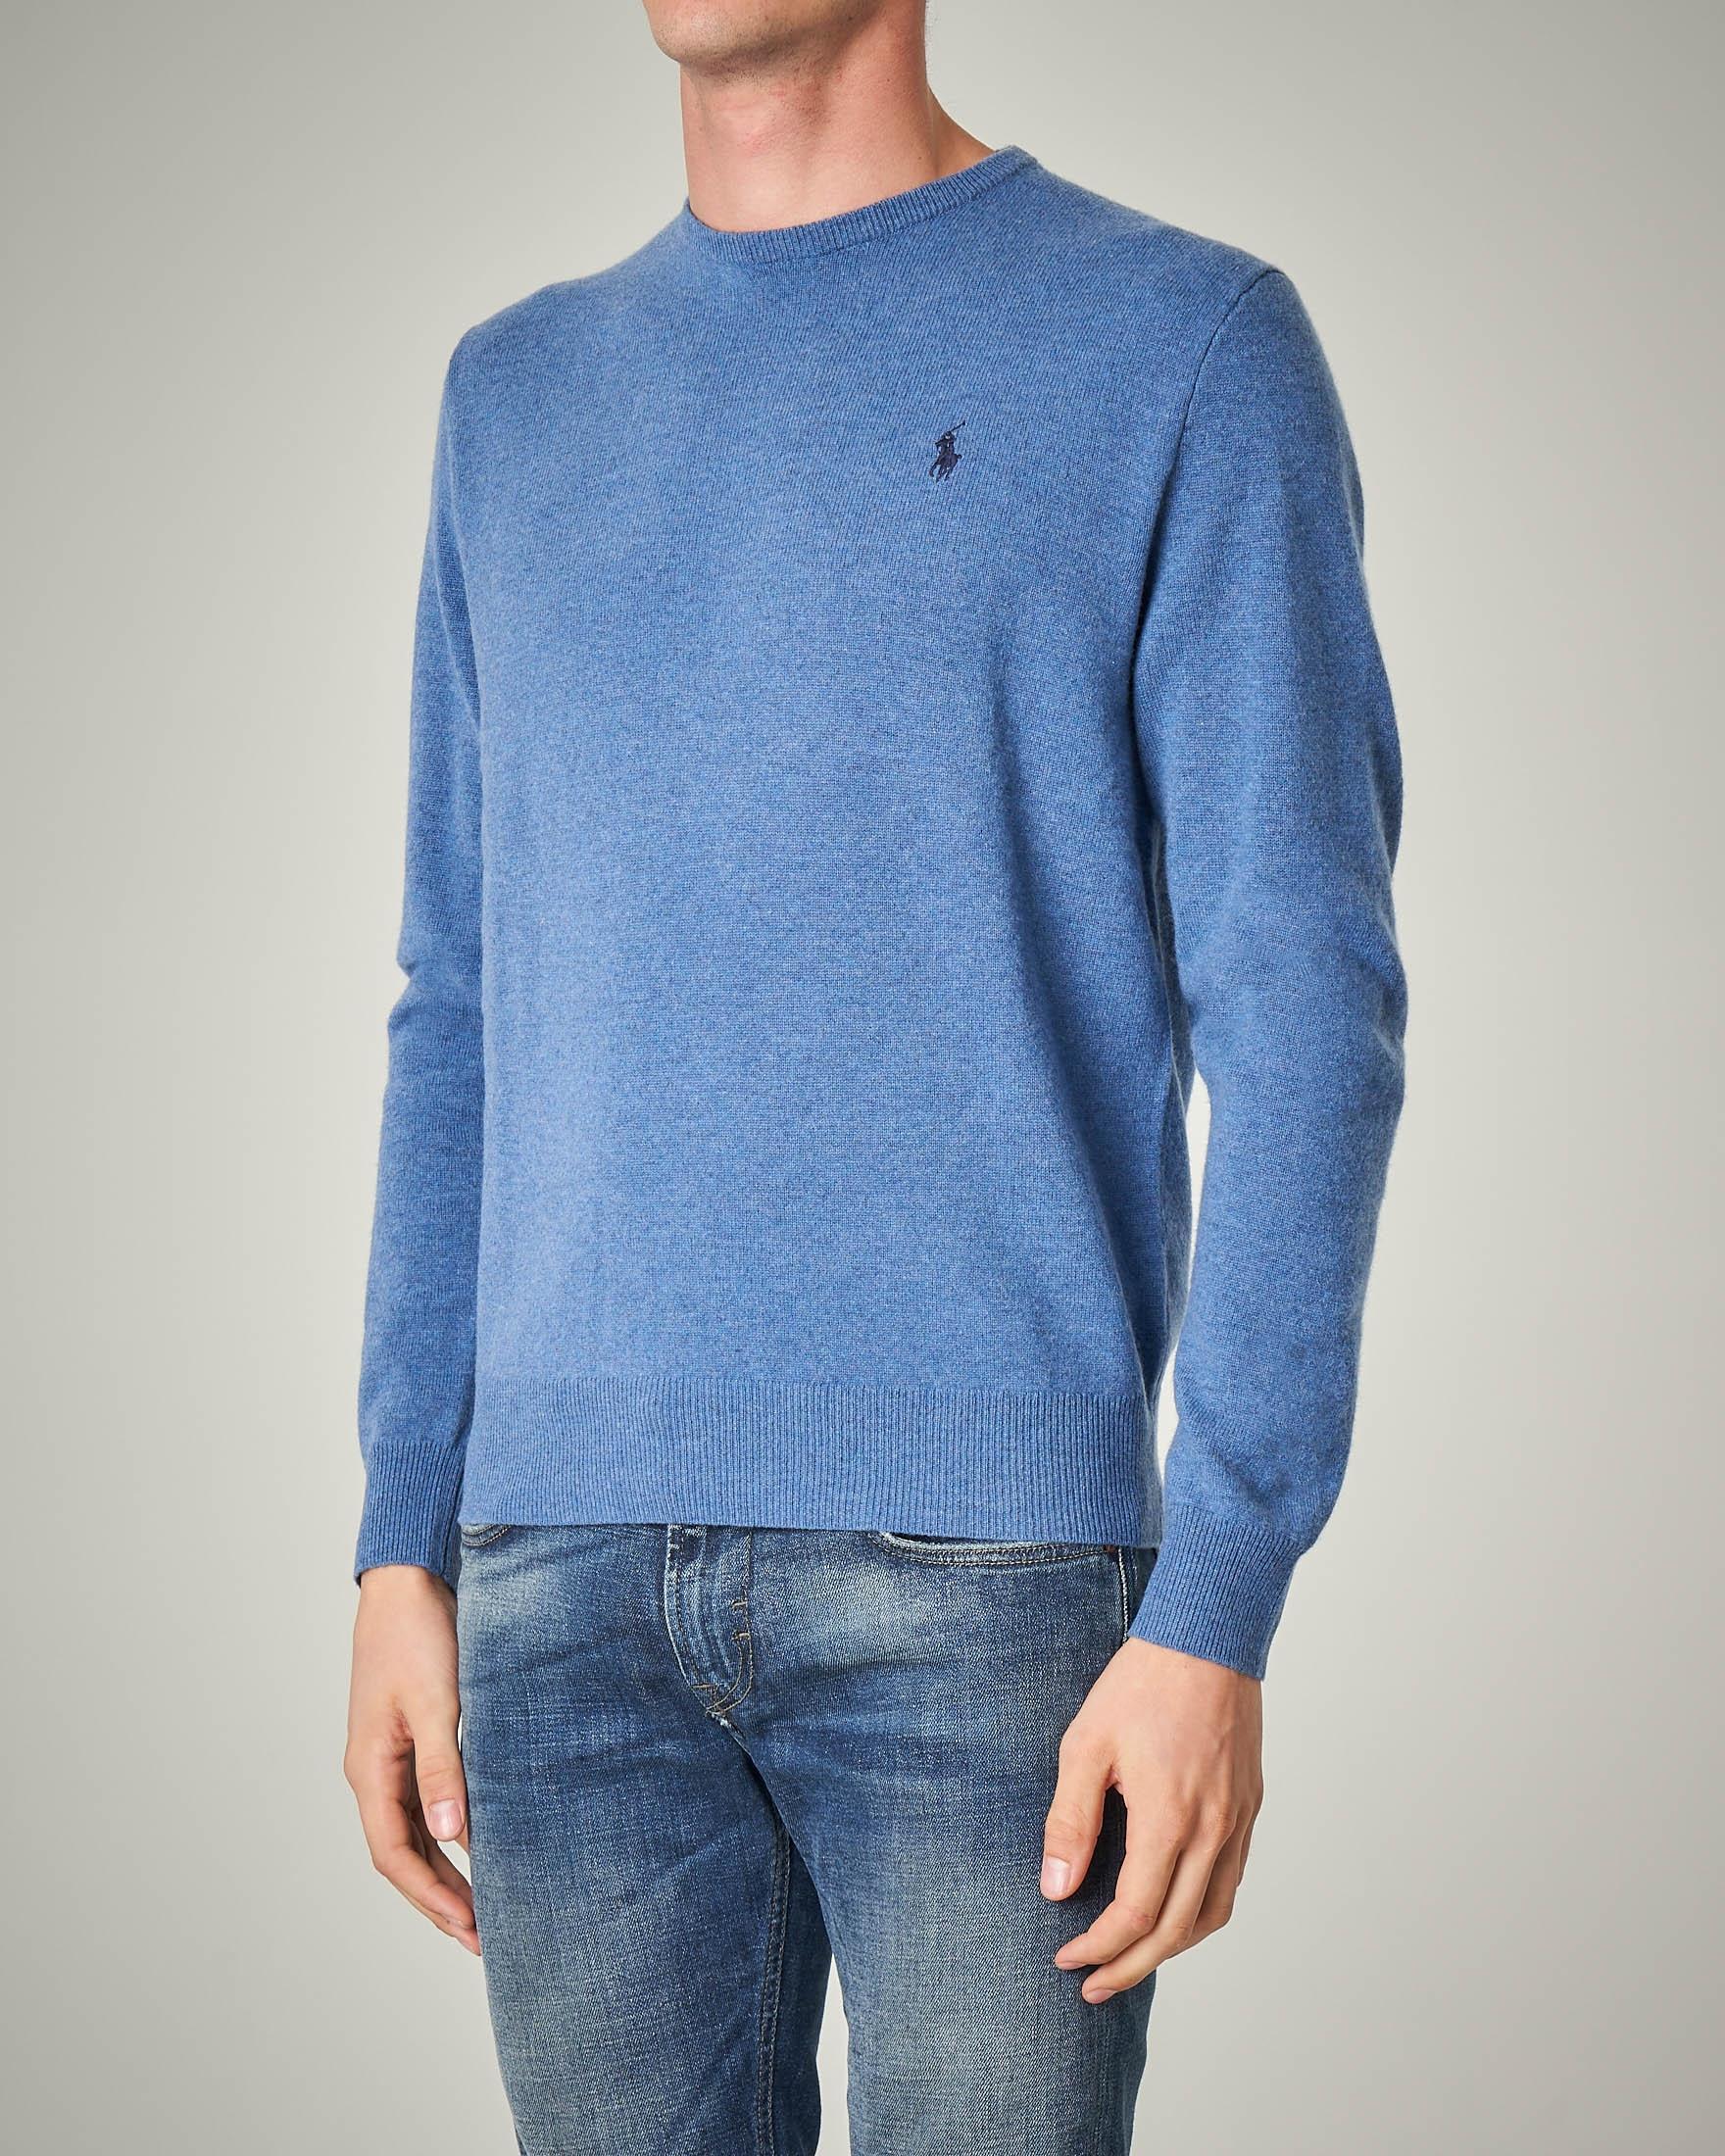 Maglia azzurro melange girocollo in lana merino